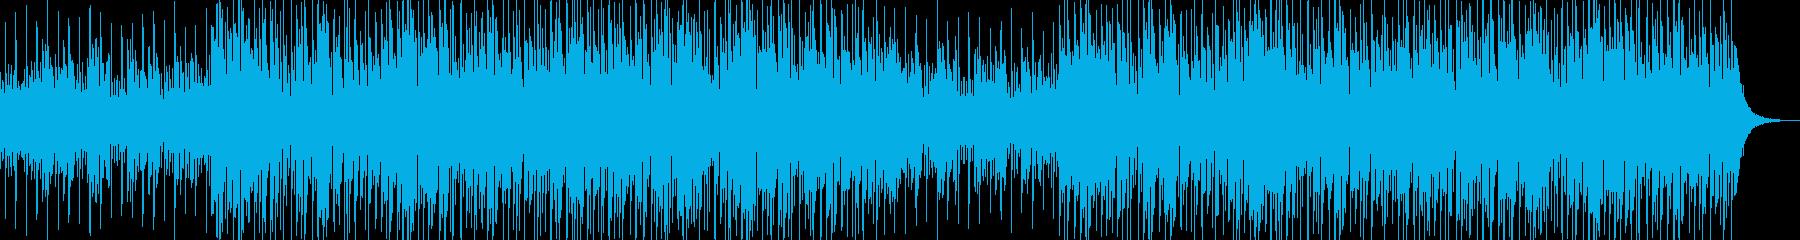 Happy Ukulele 10の再生済みの波形